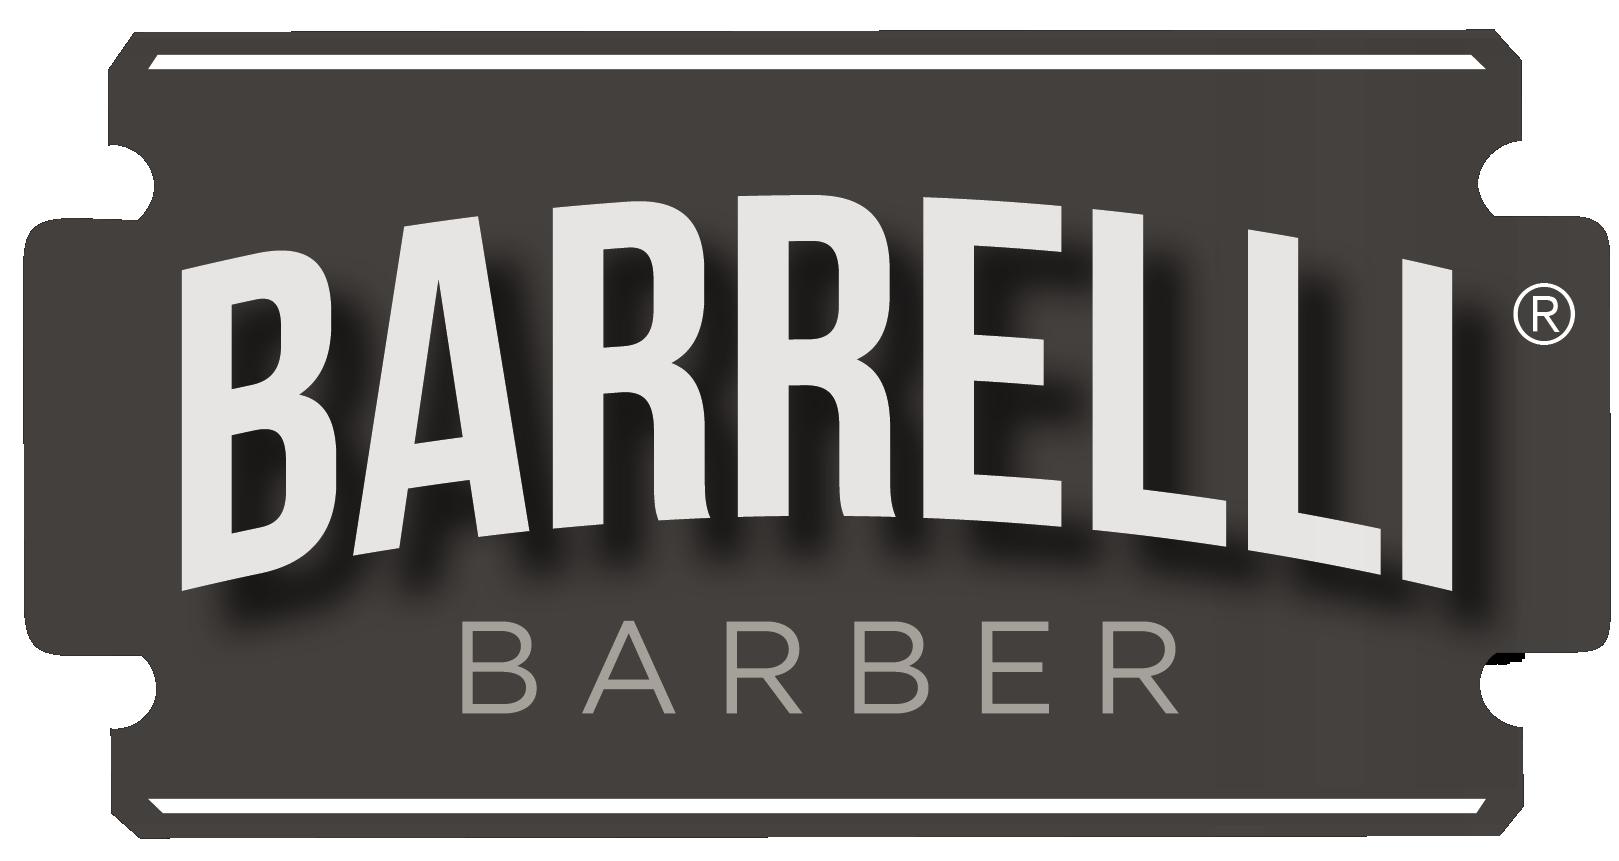 Barrelli Barber